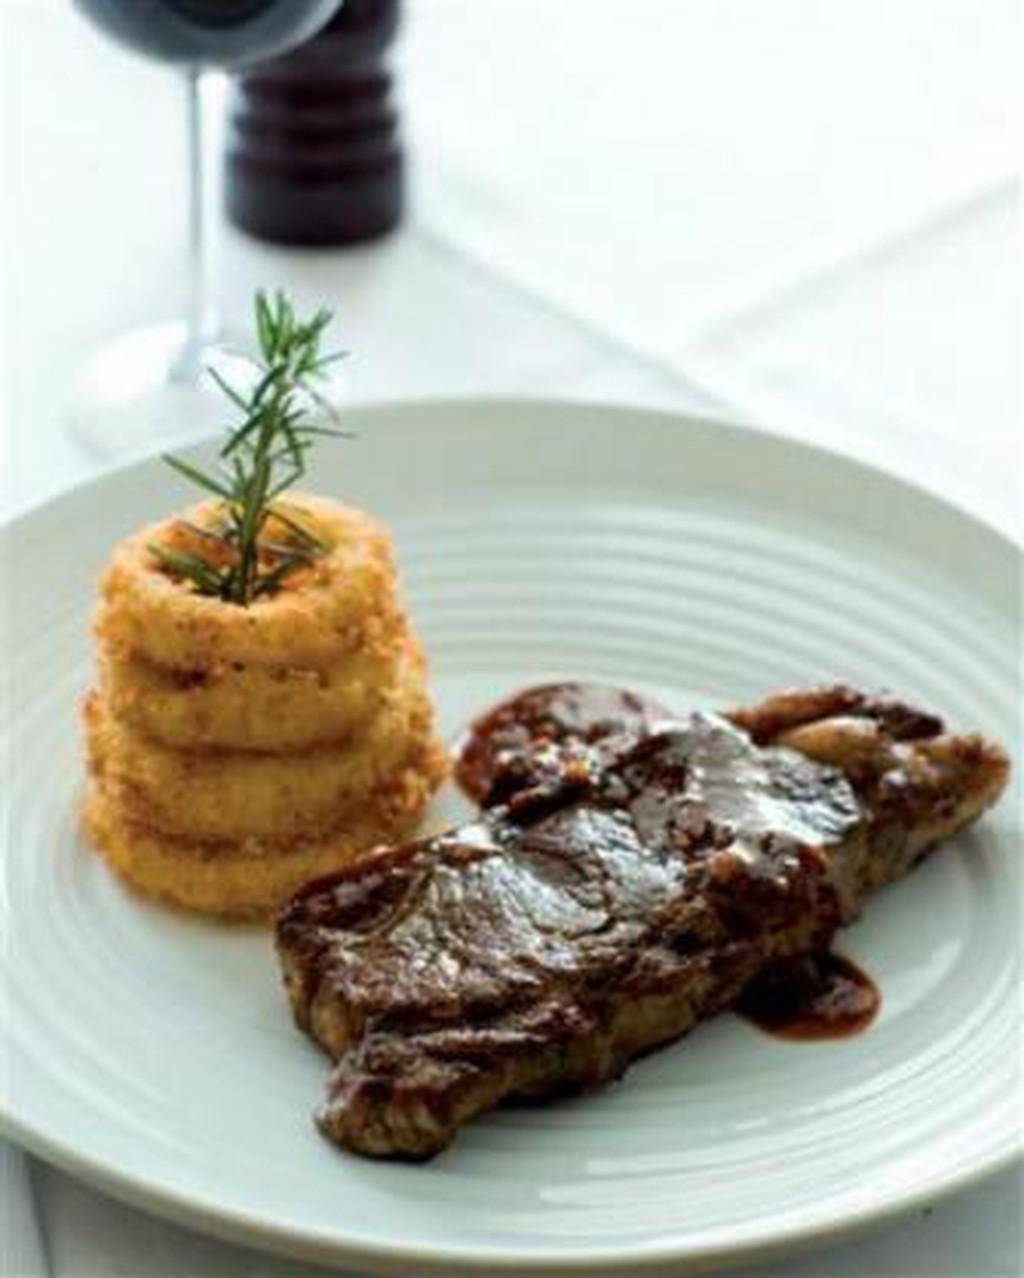 Jervois Steakhouse